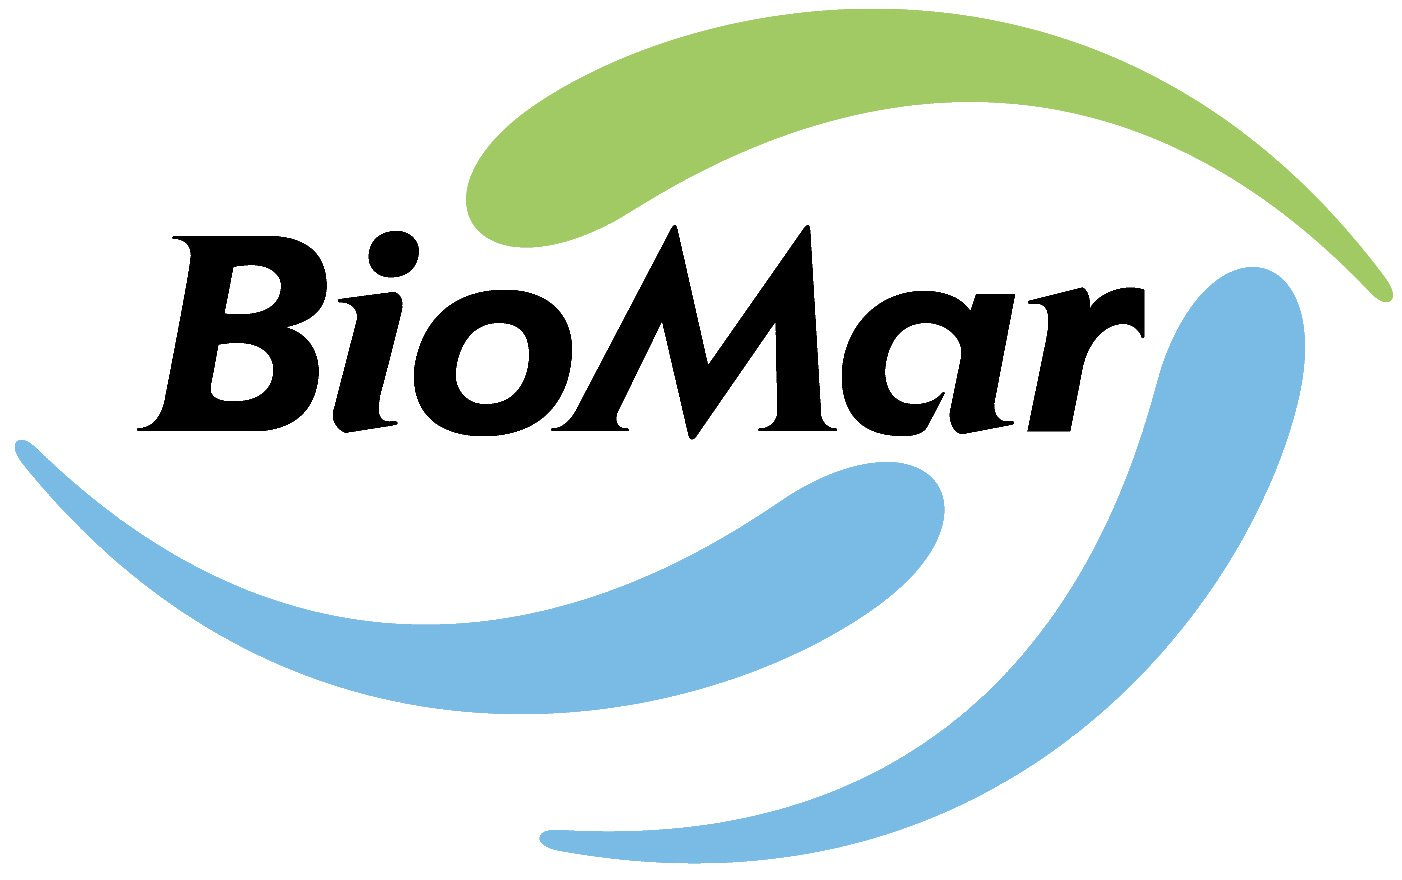 BioMar logo